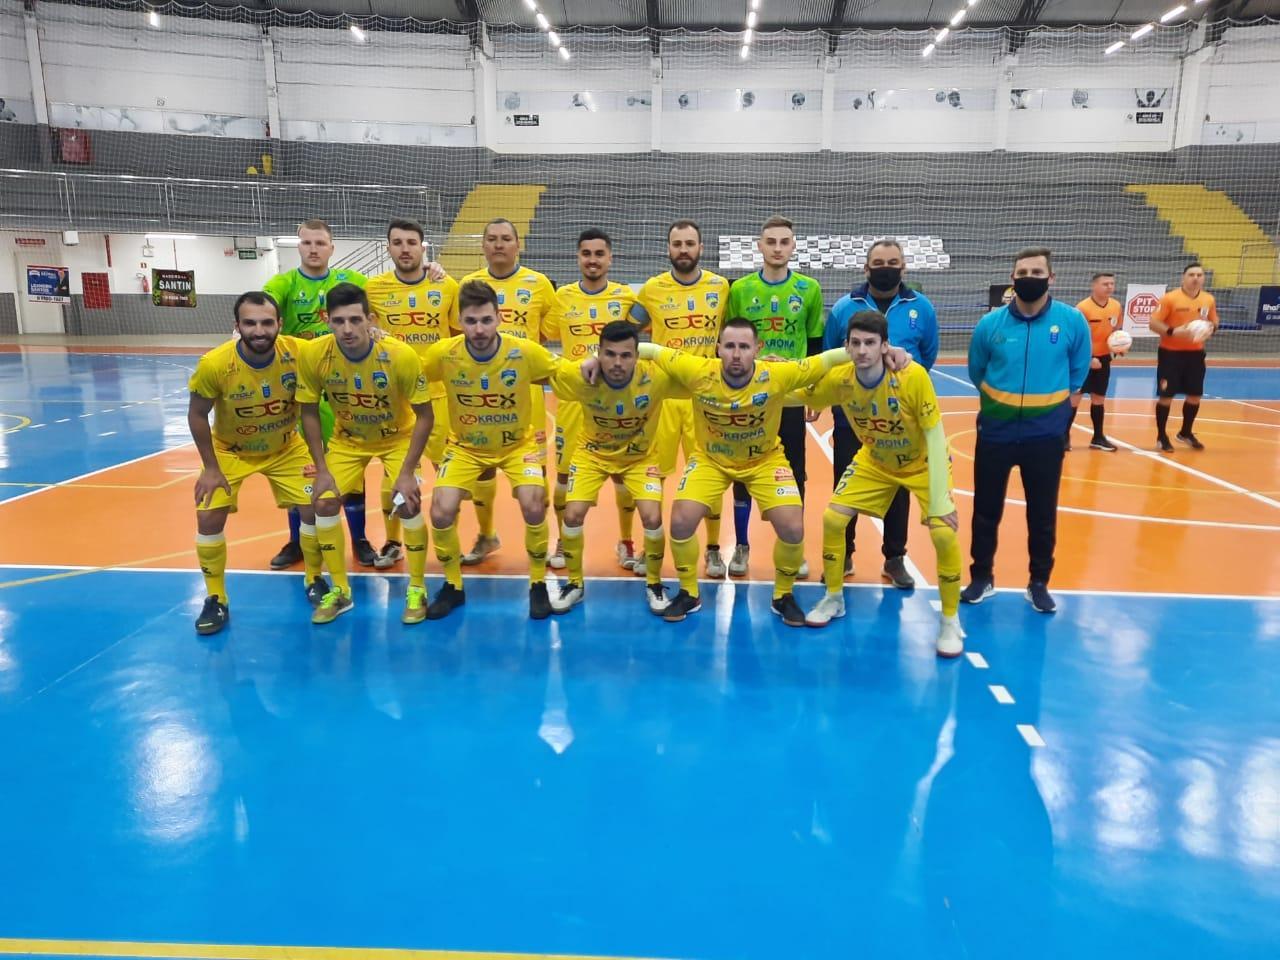 Rio do Sul vence na estreia da Liga Catarinense de Futsal